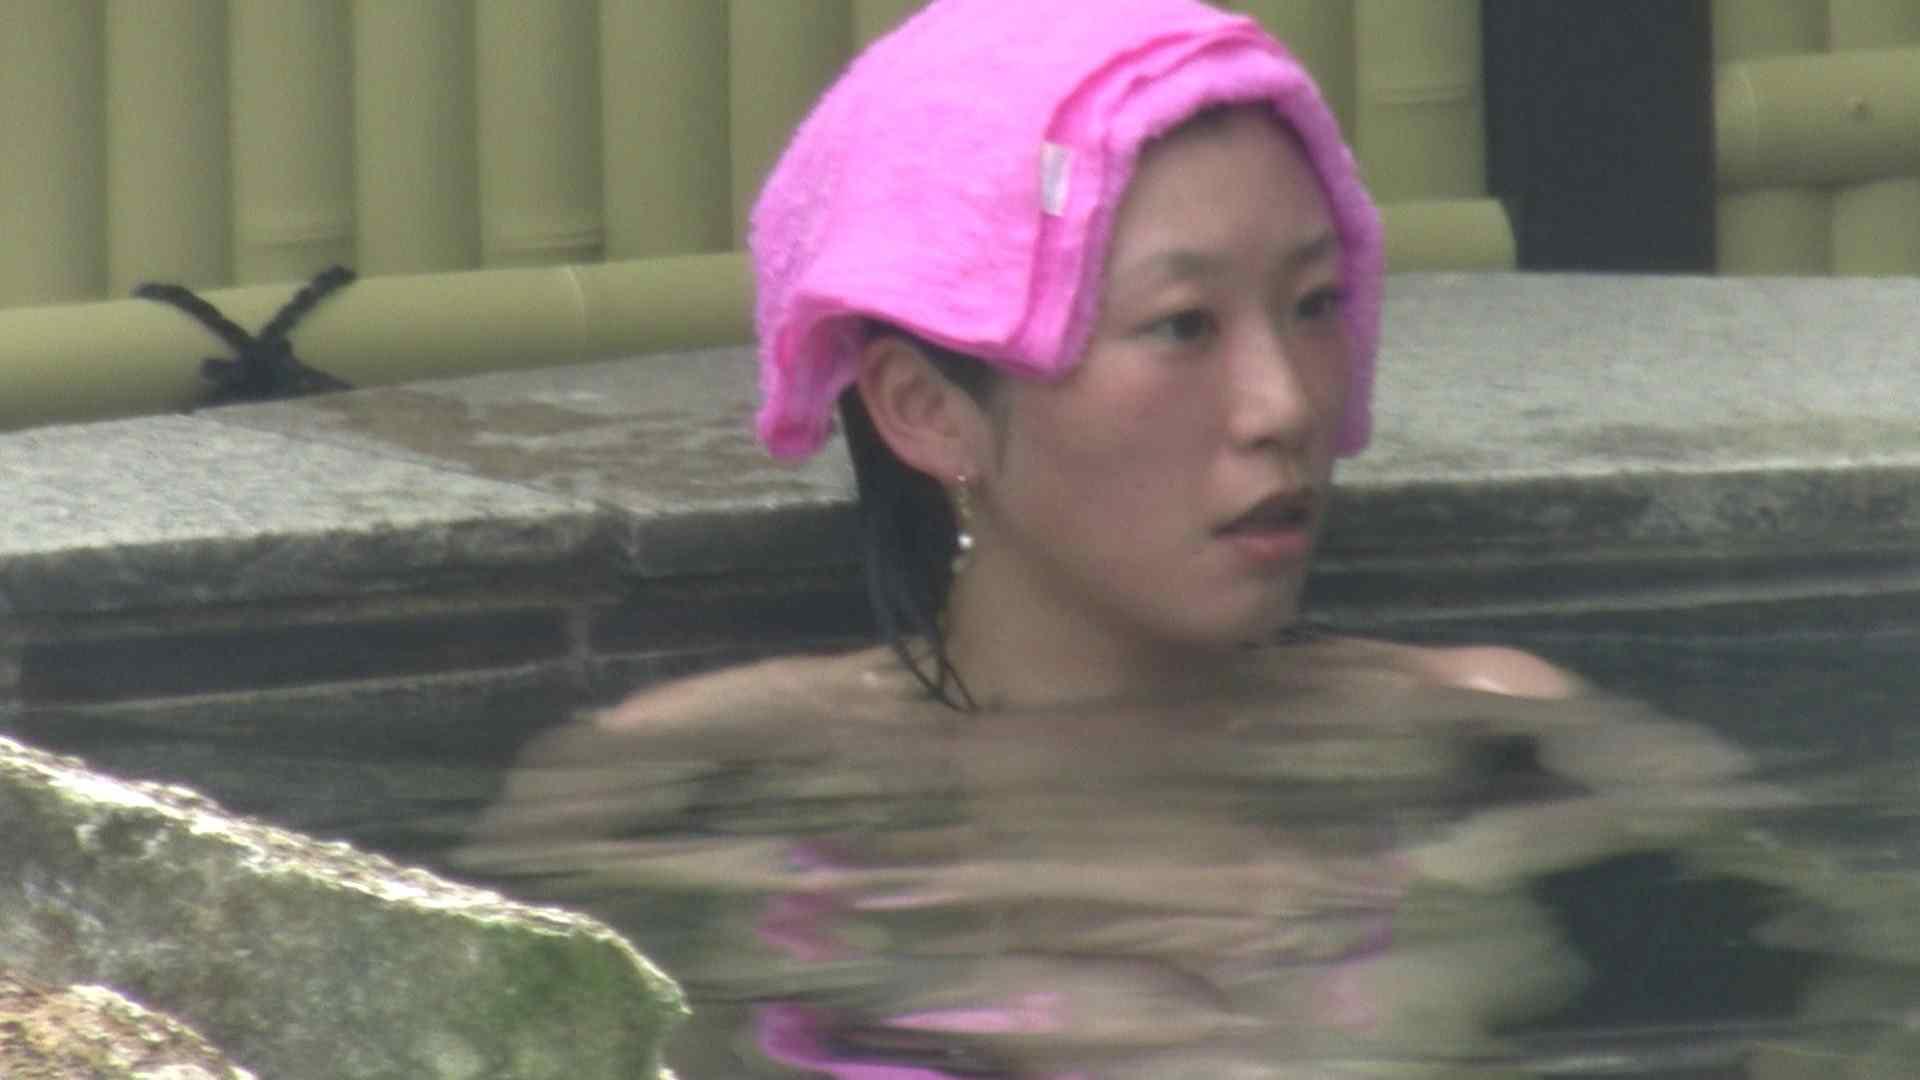 Aquaな露天風呂Vol.127 盗撮師作品  77pic 54